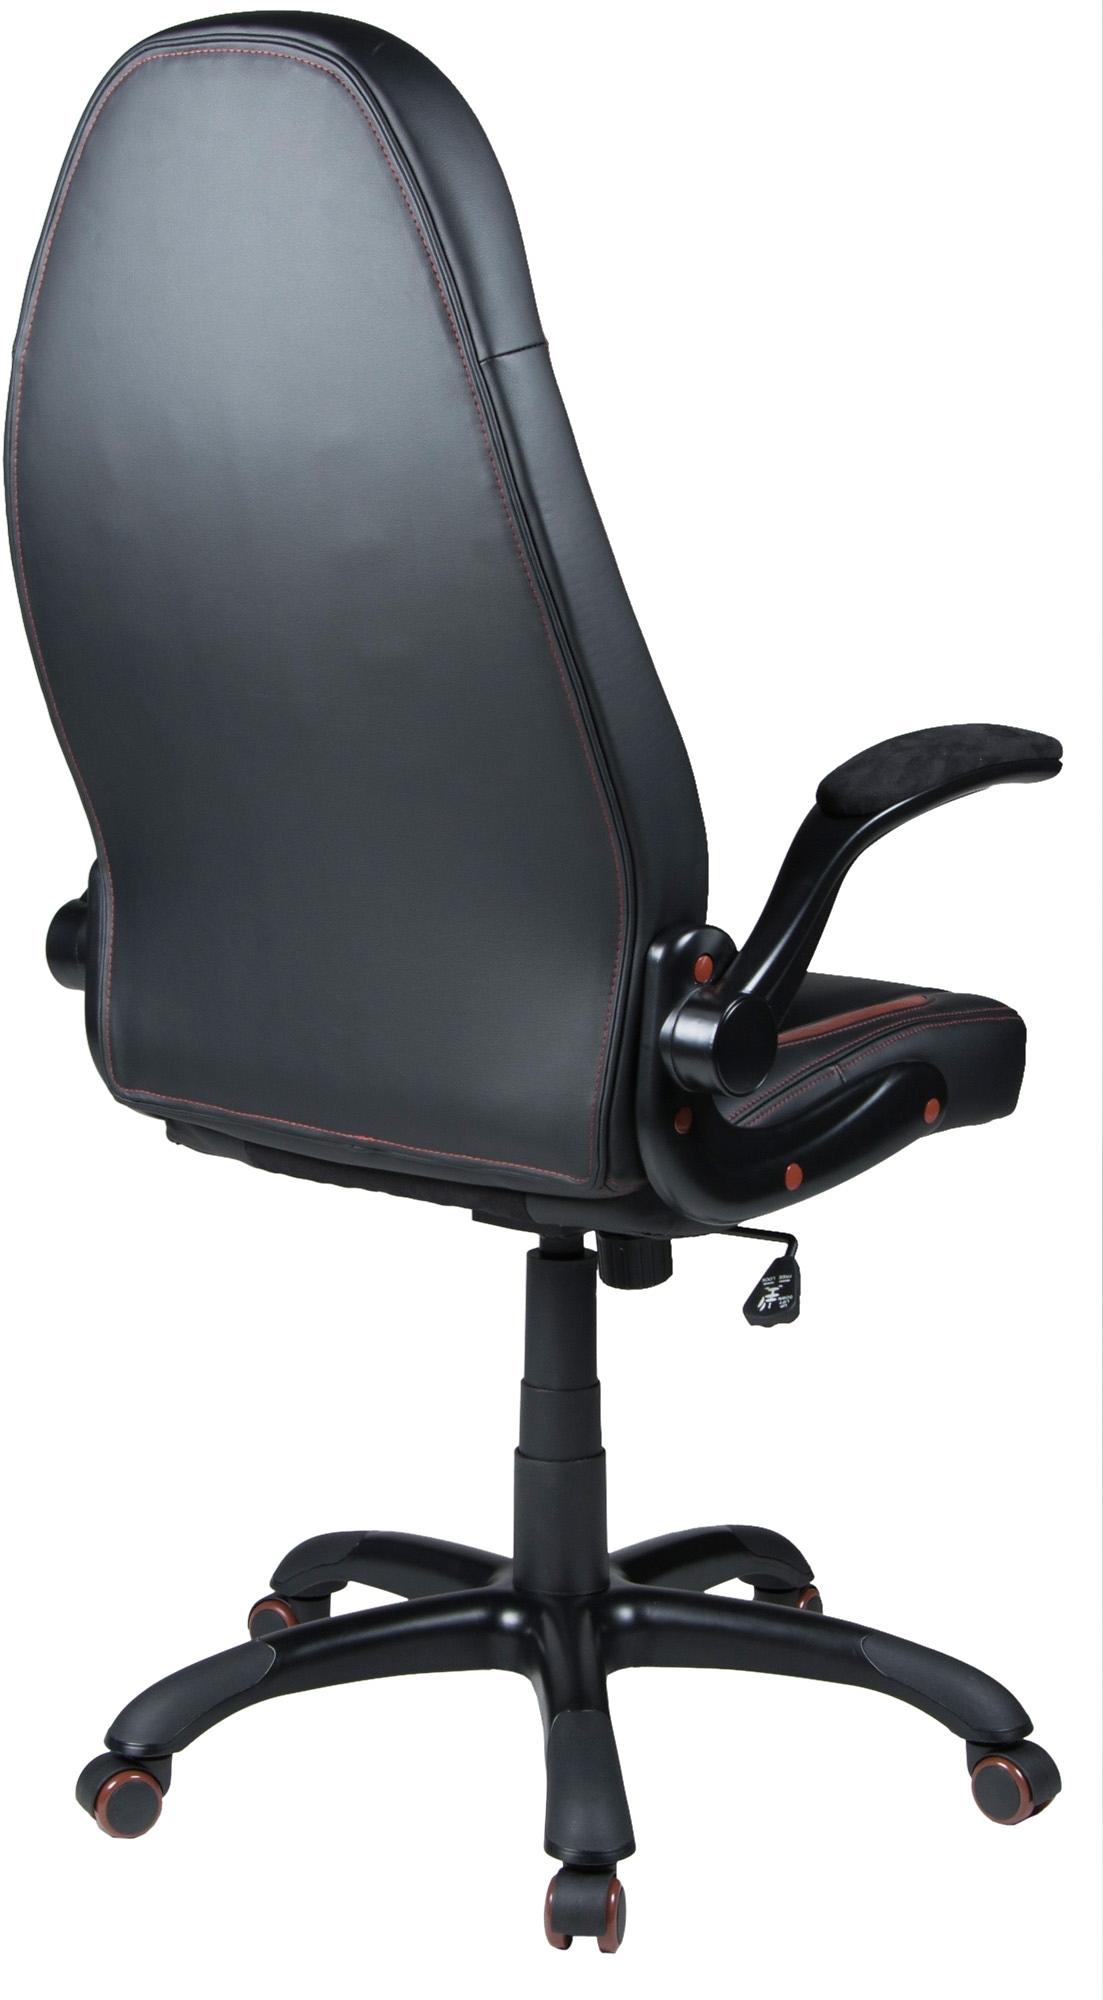 Bureaustoel Met Armleuning.Bureaustoel Damian